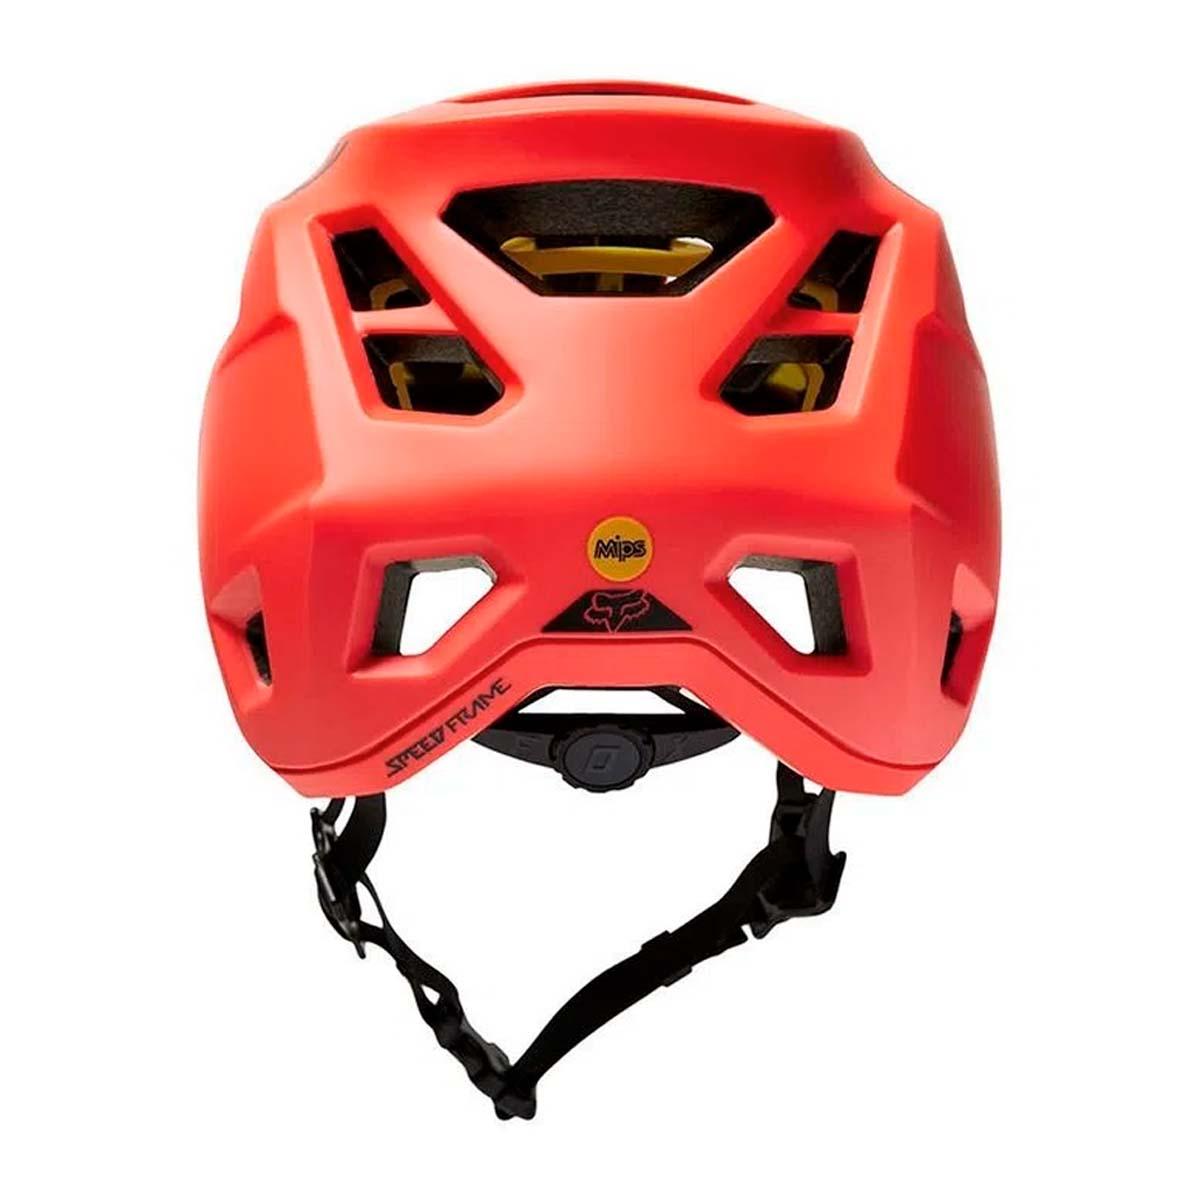 Capacete Fox Speedframe Laranja Com Mips Ciclismo 21